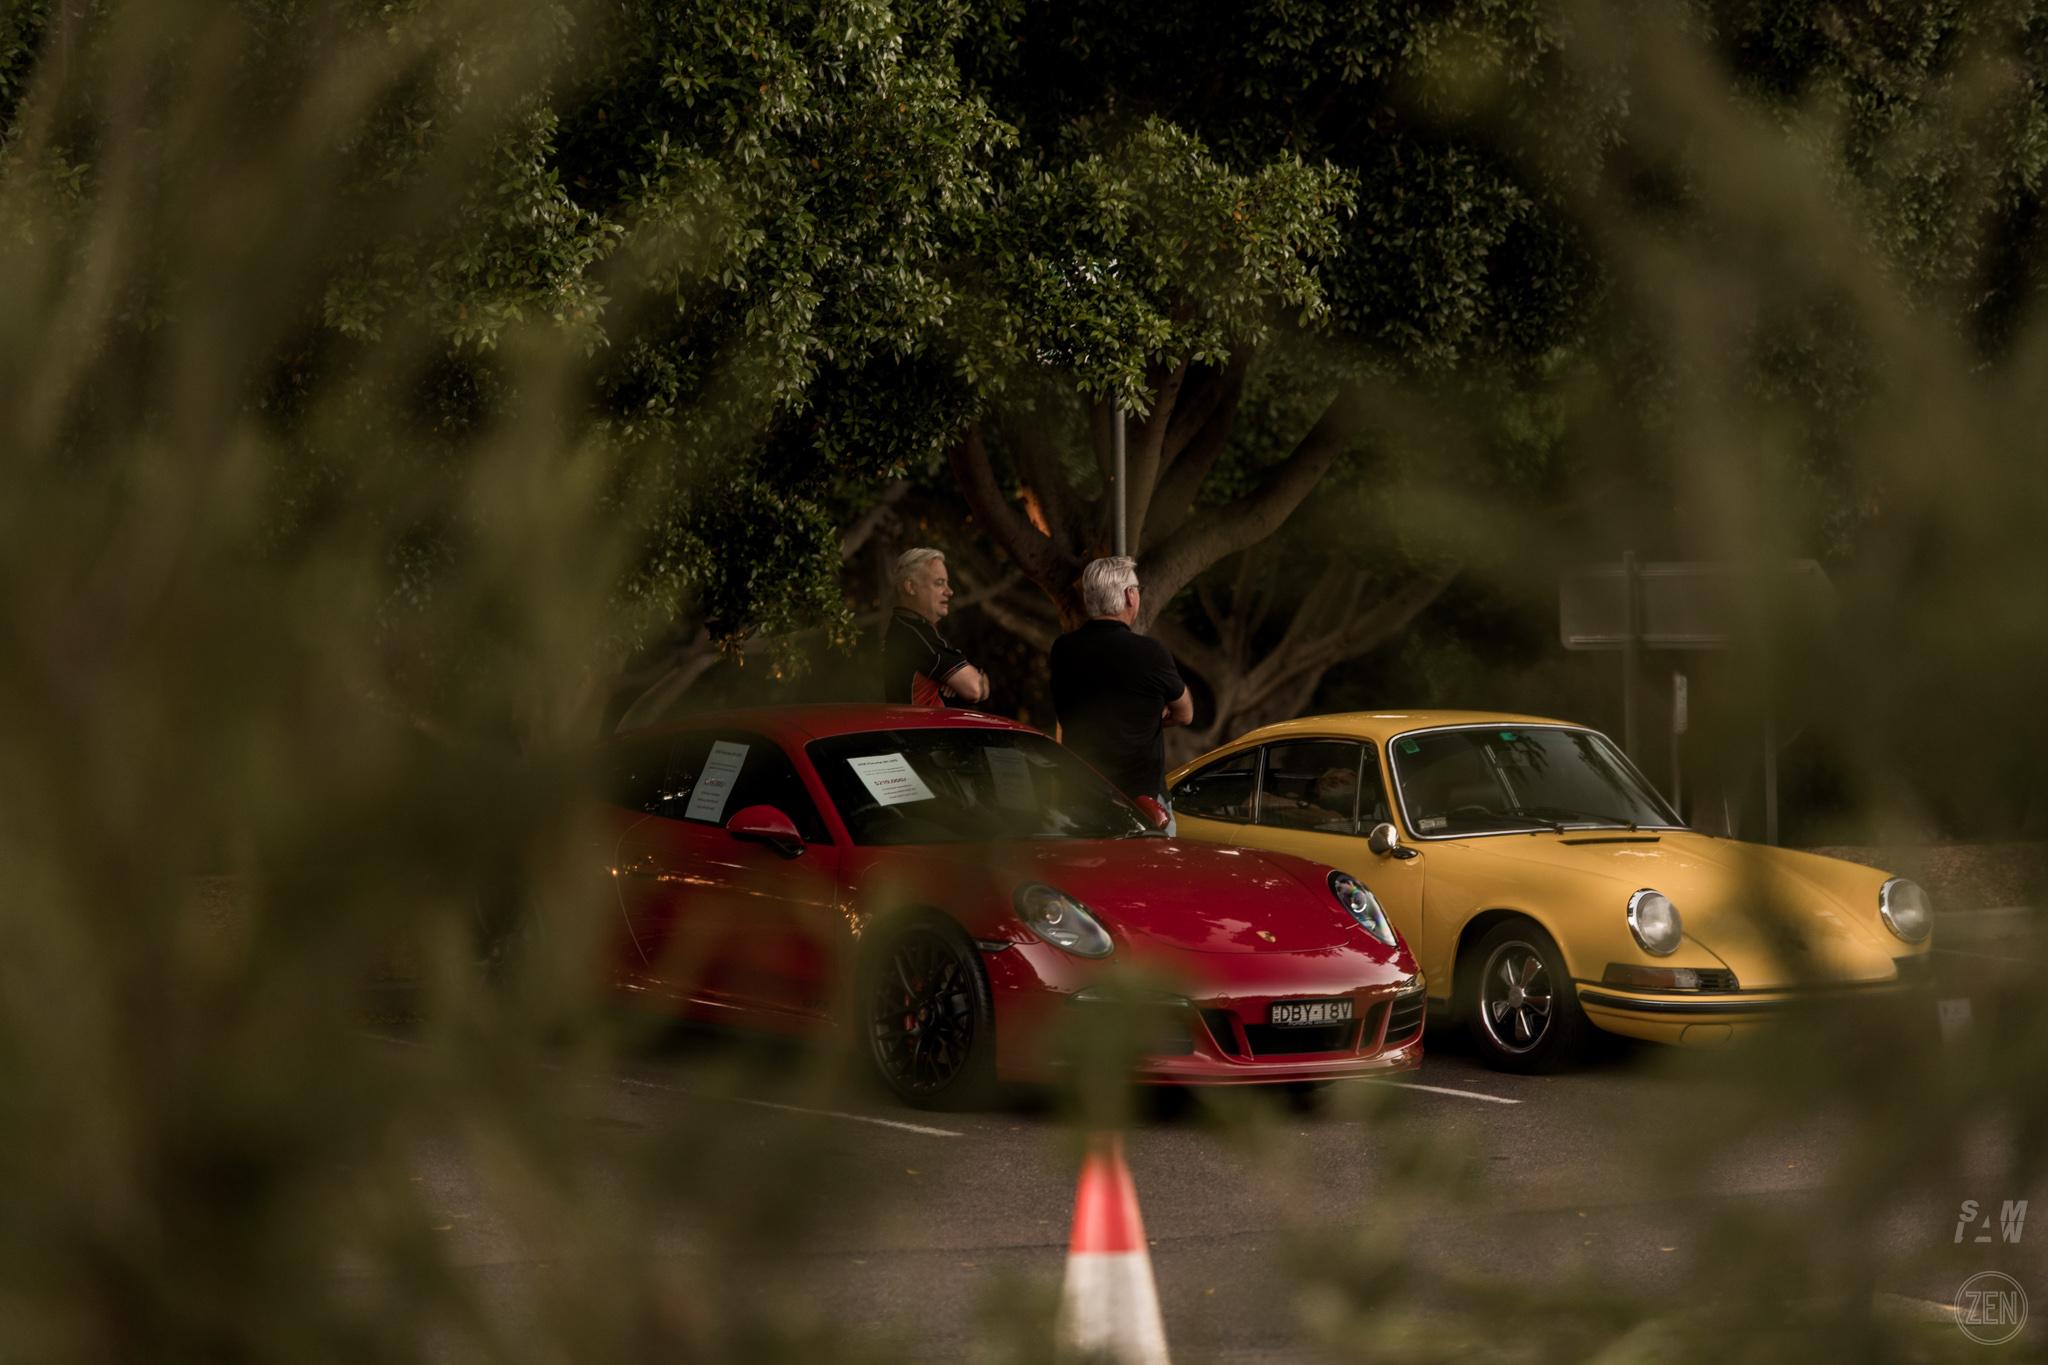 2019-10-27 - Autohaus Porsches & Coffee 002